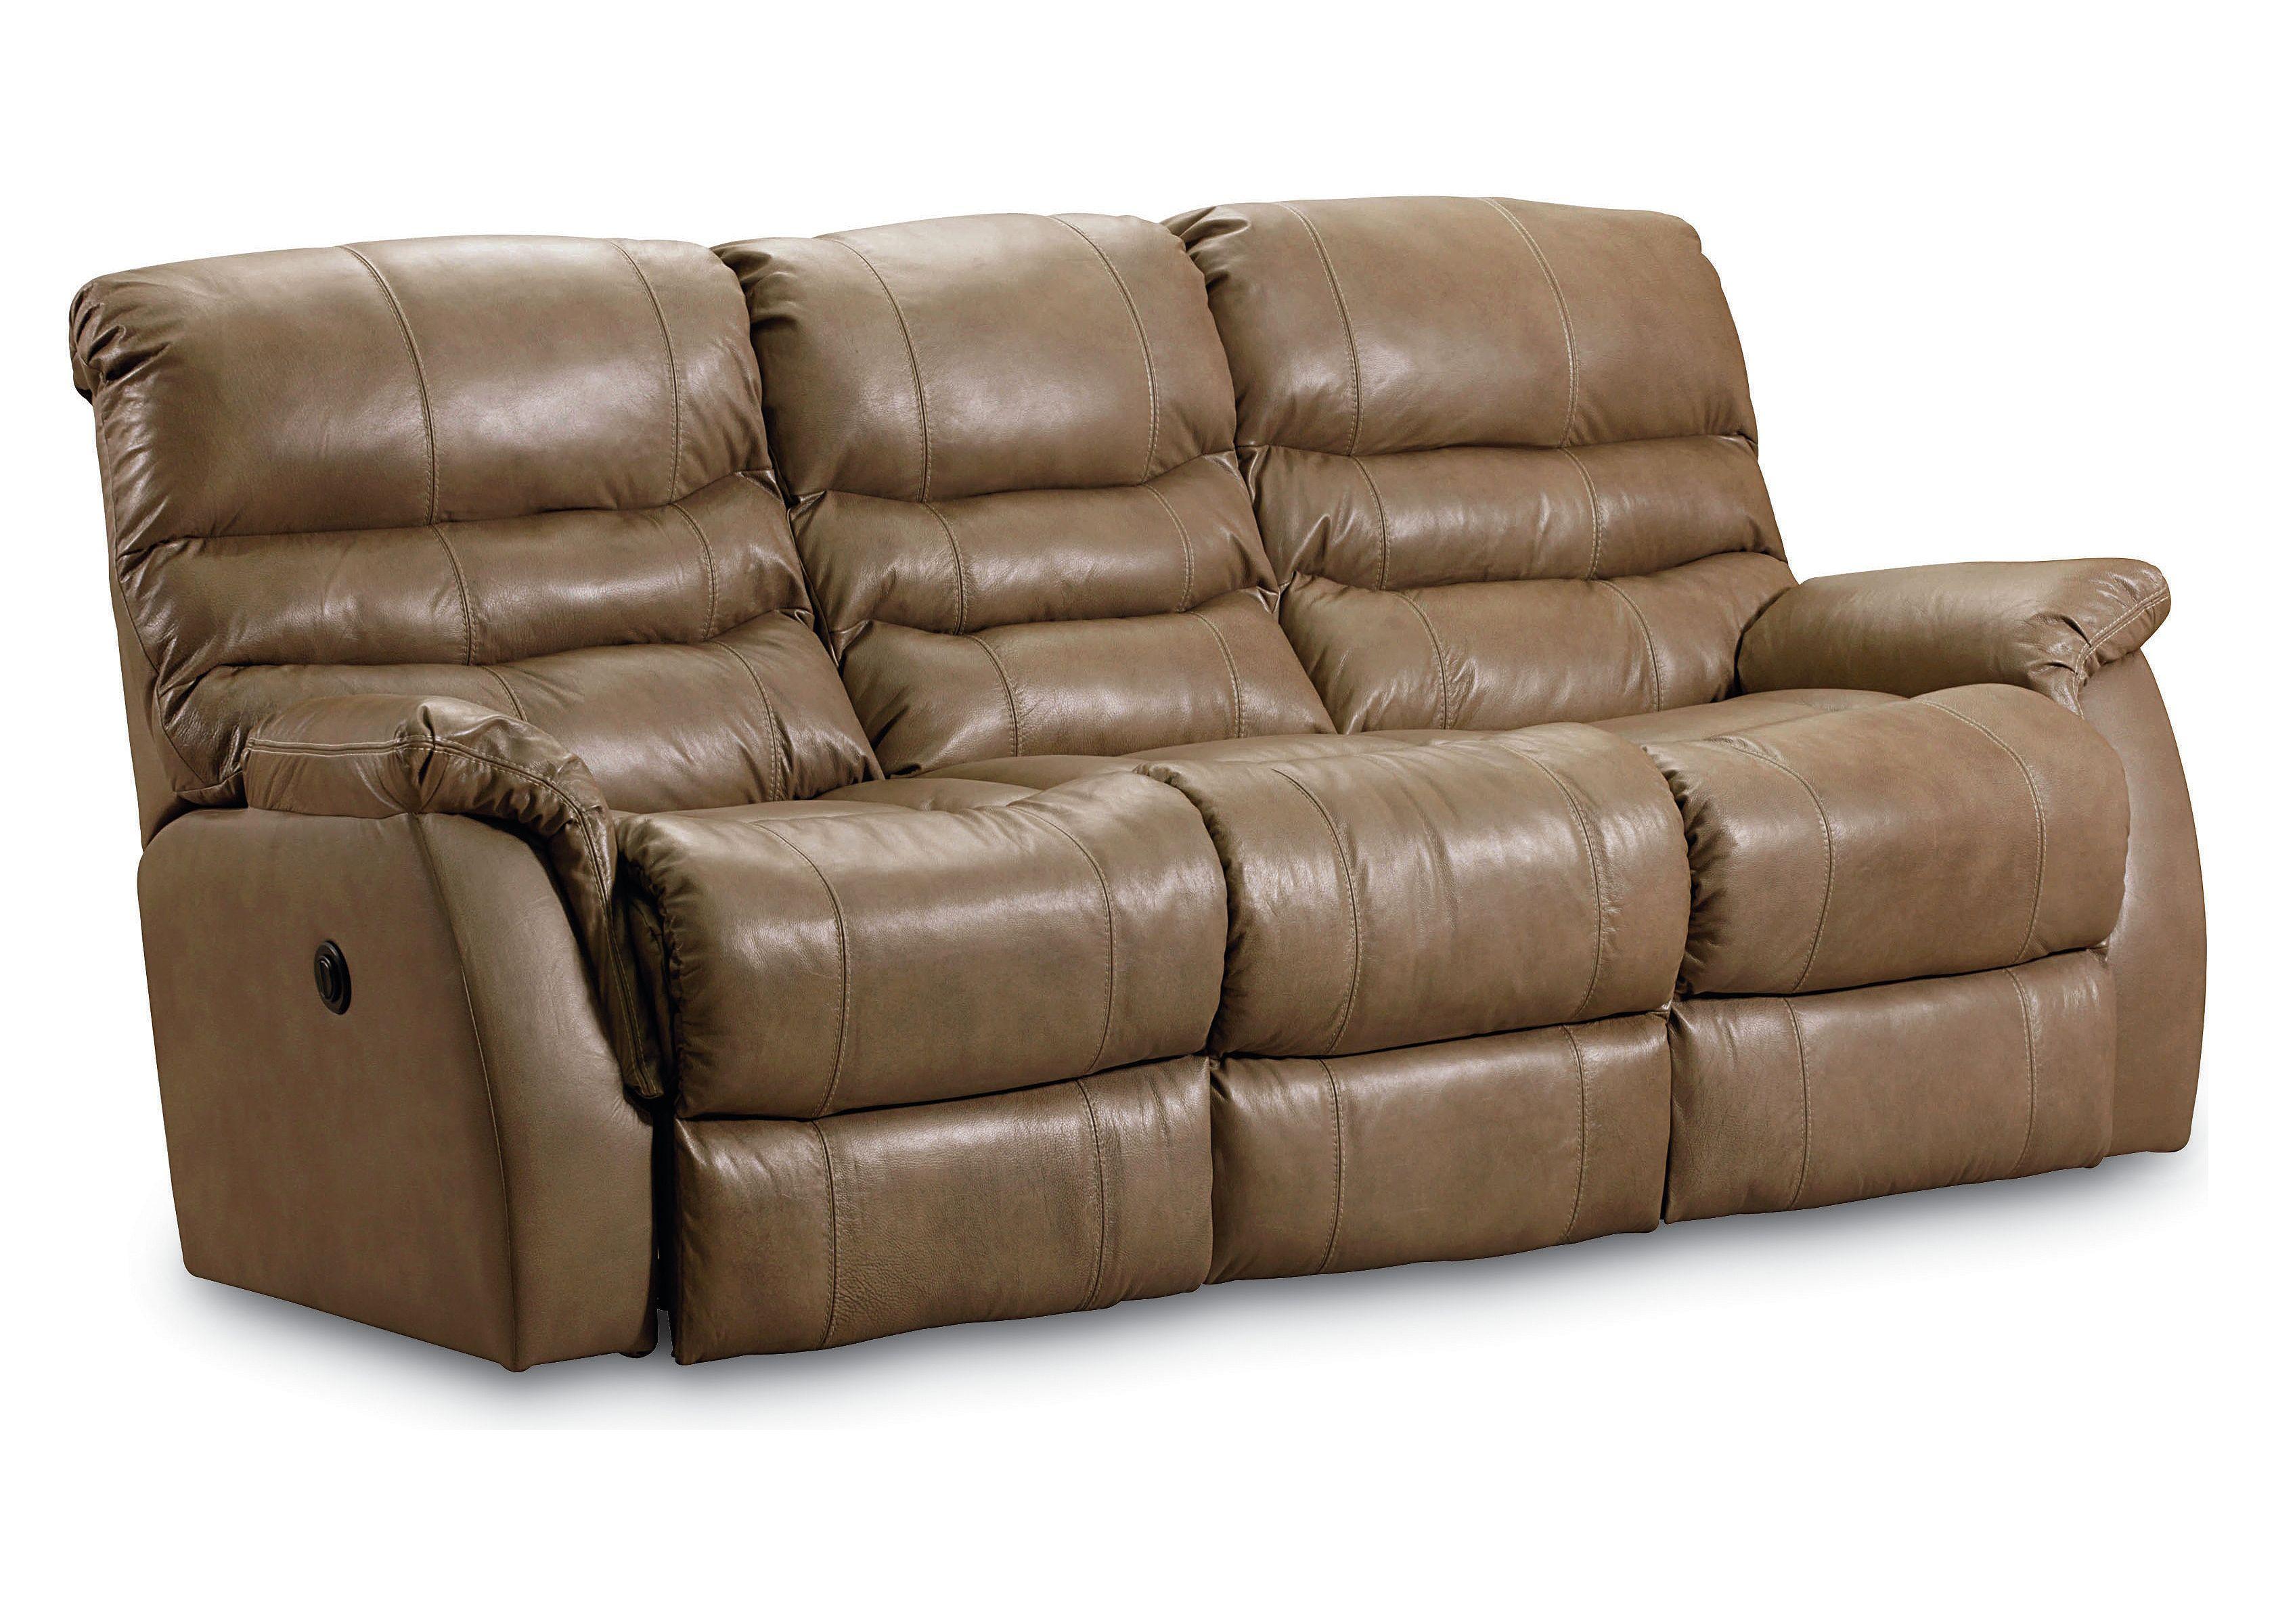 lane dual power reclining sofa sleepers full size garrett casual double